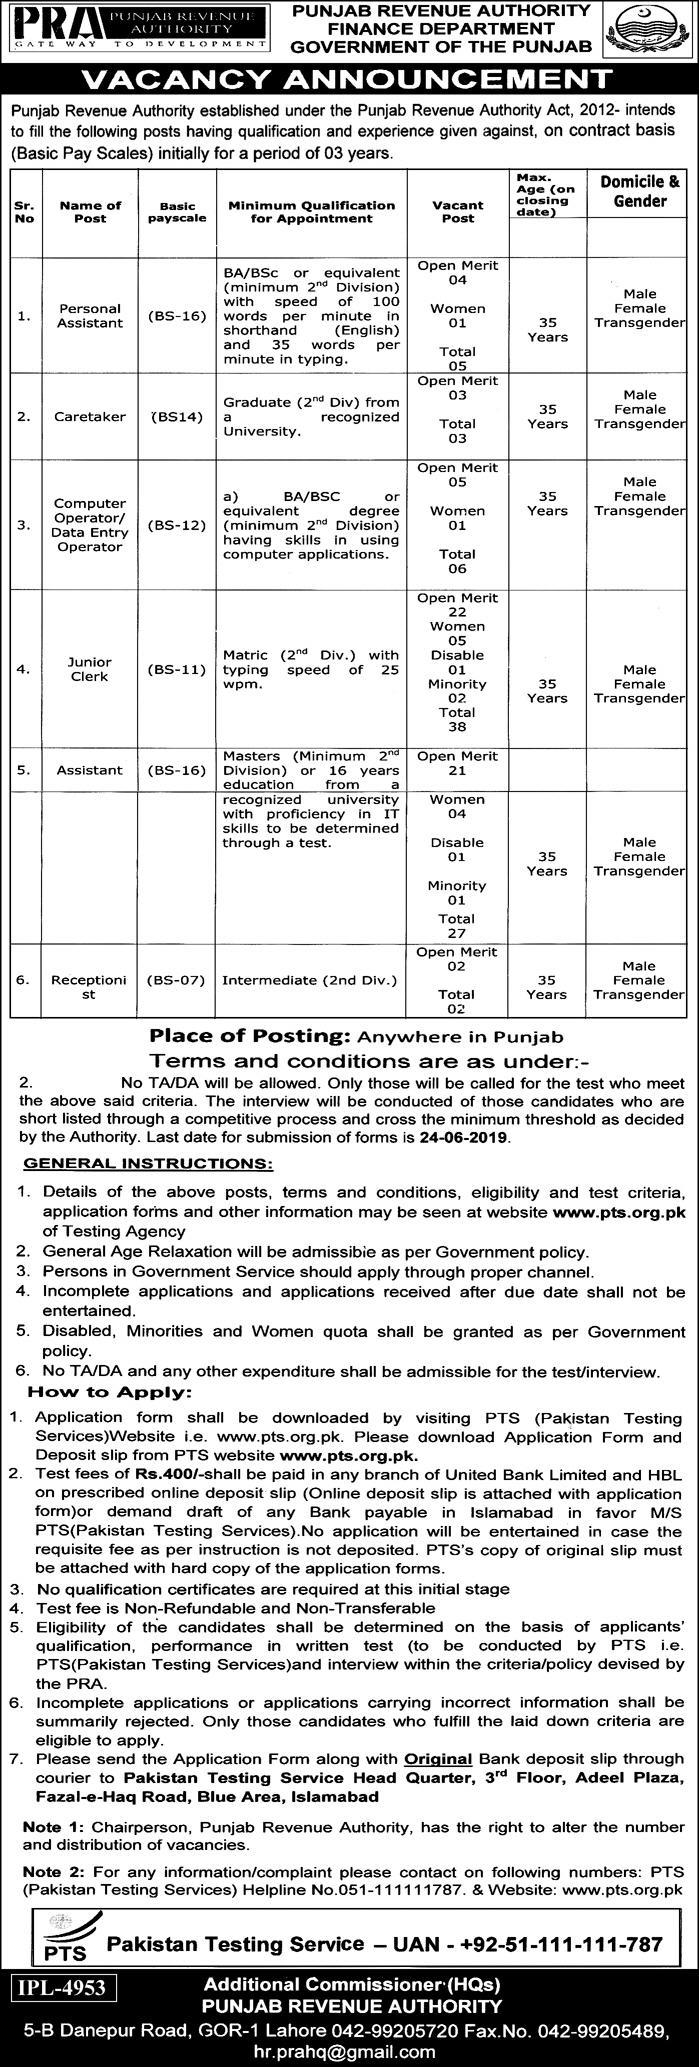 Punjab Revenue Authority PRA Jobs 2019 PTS Application Form Download